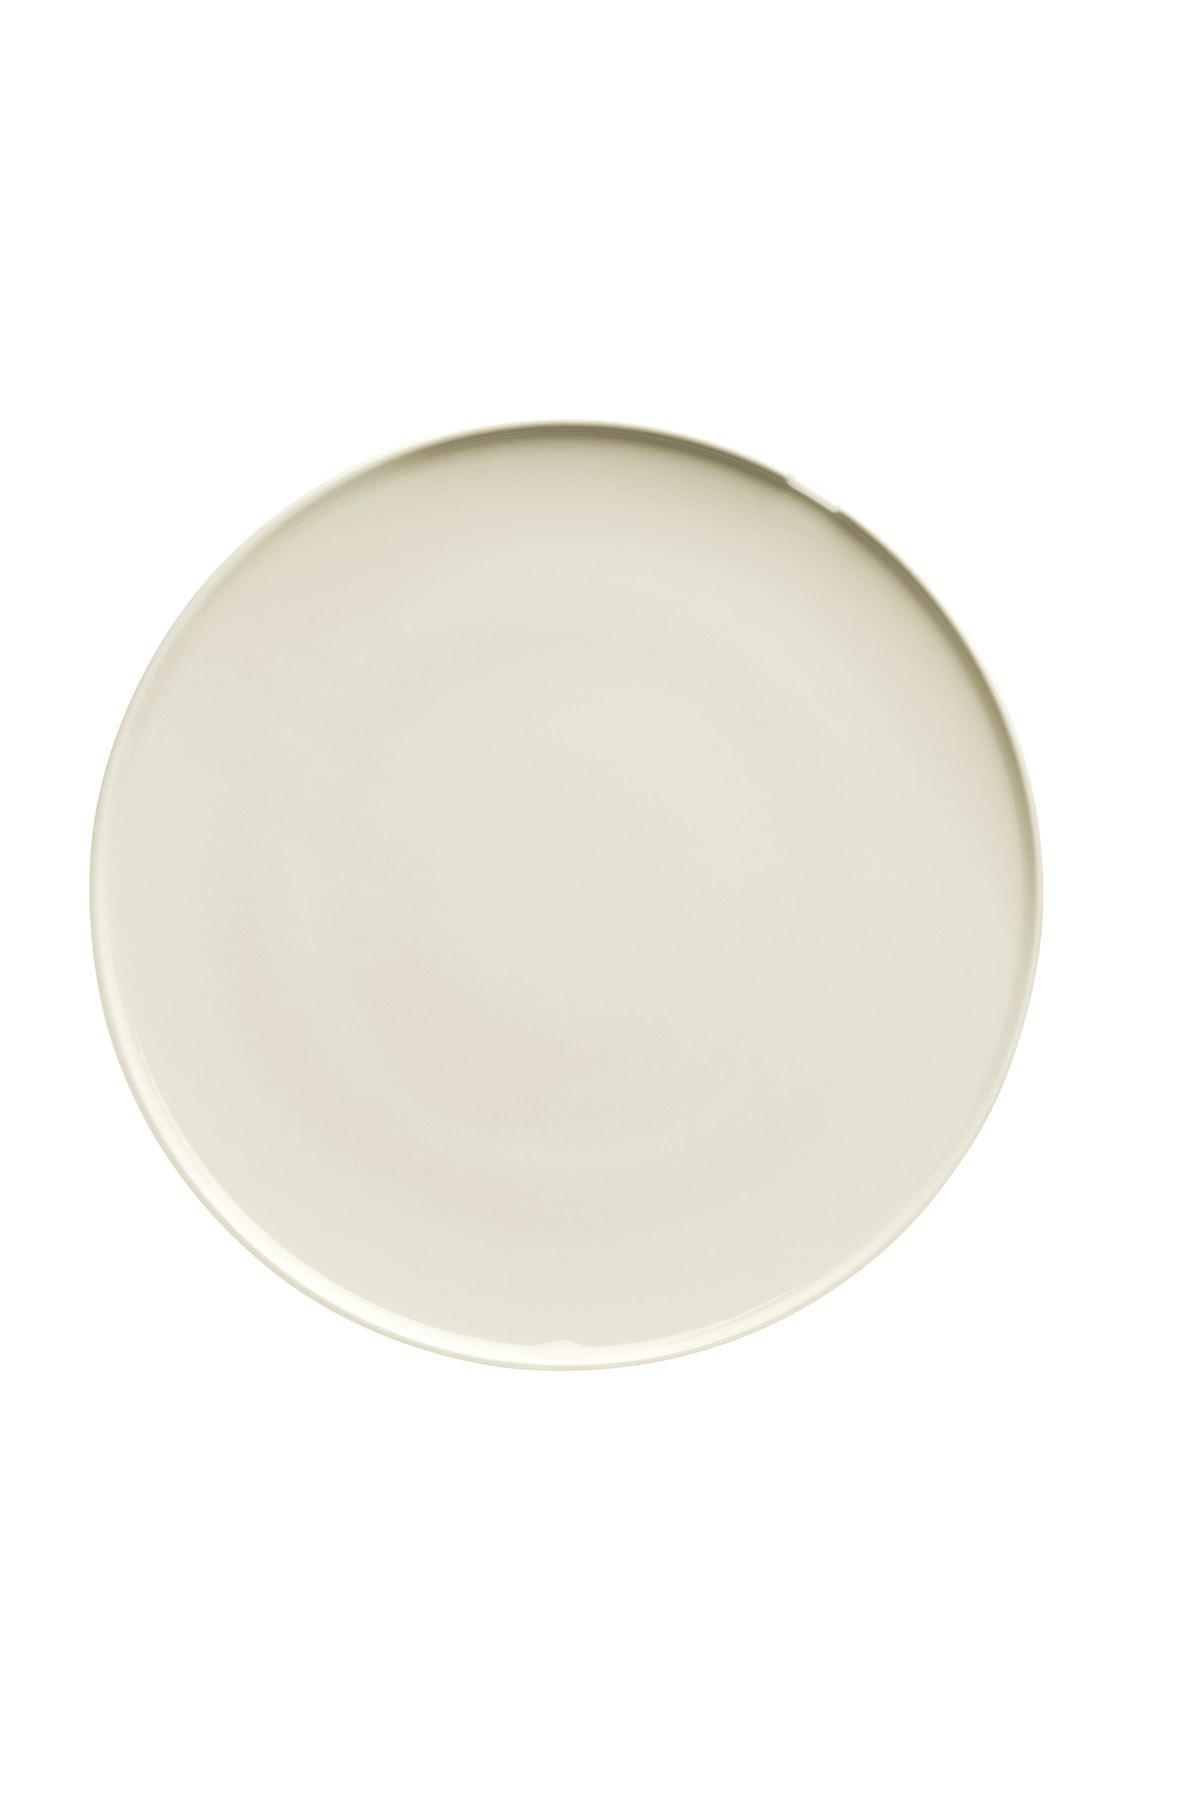 Kütahya Porselen - Kütahya Porselen Chef Taste Of 25 cm Düz Tabak Krem